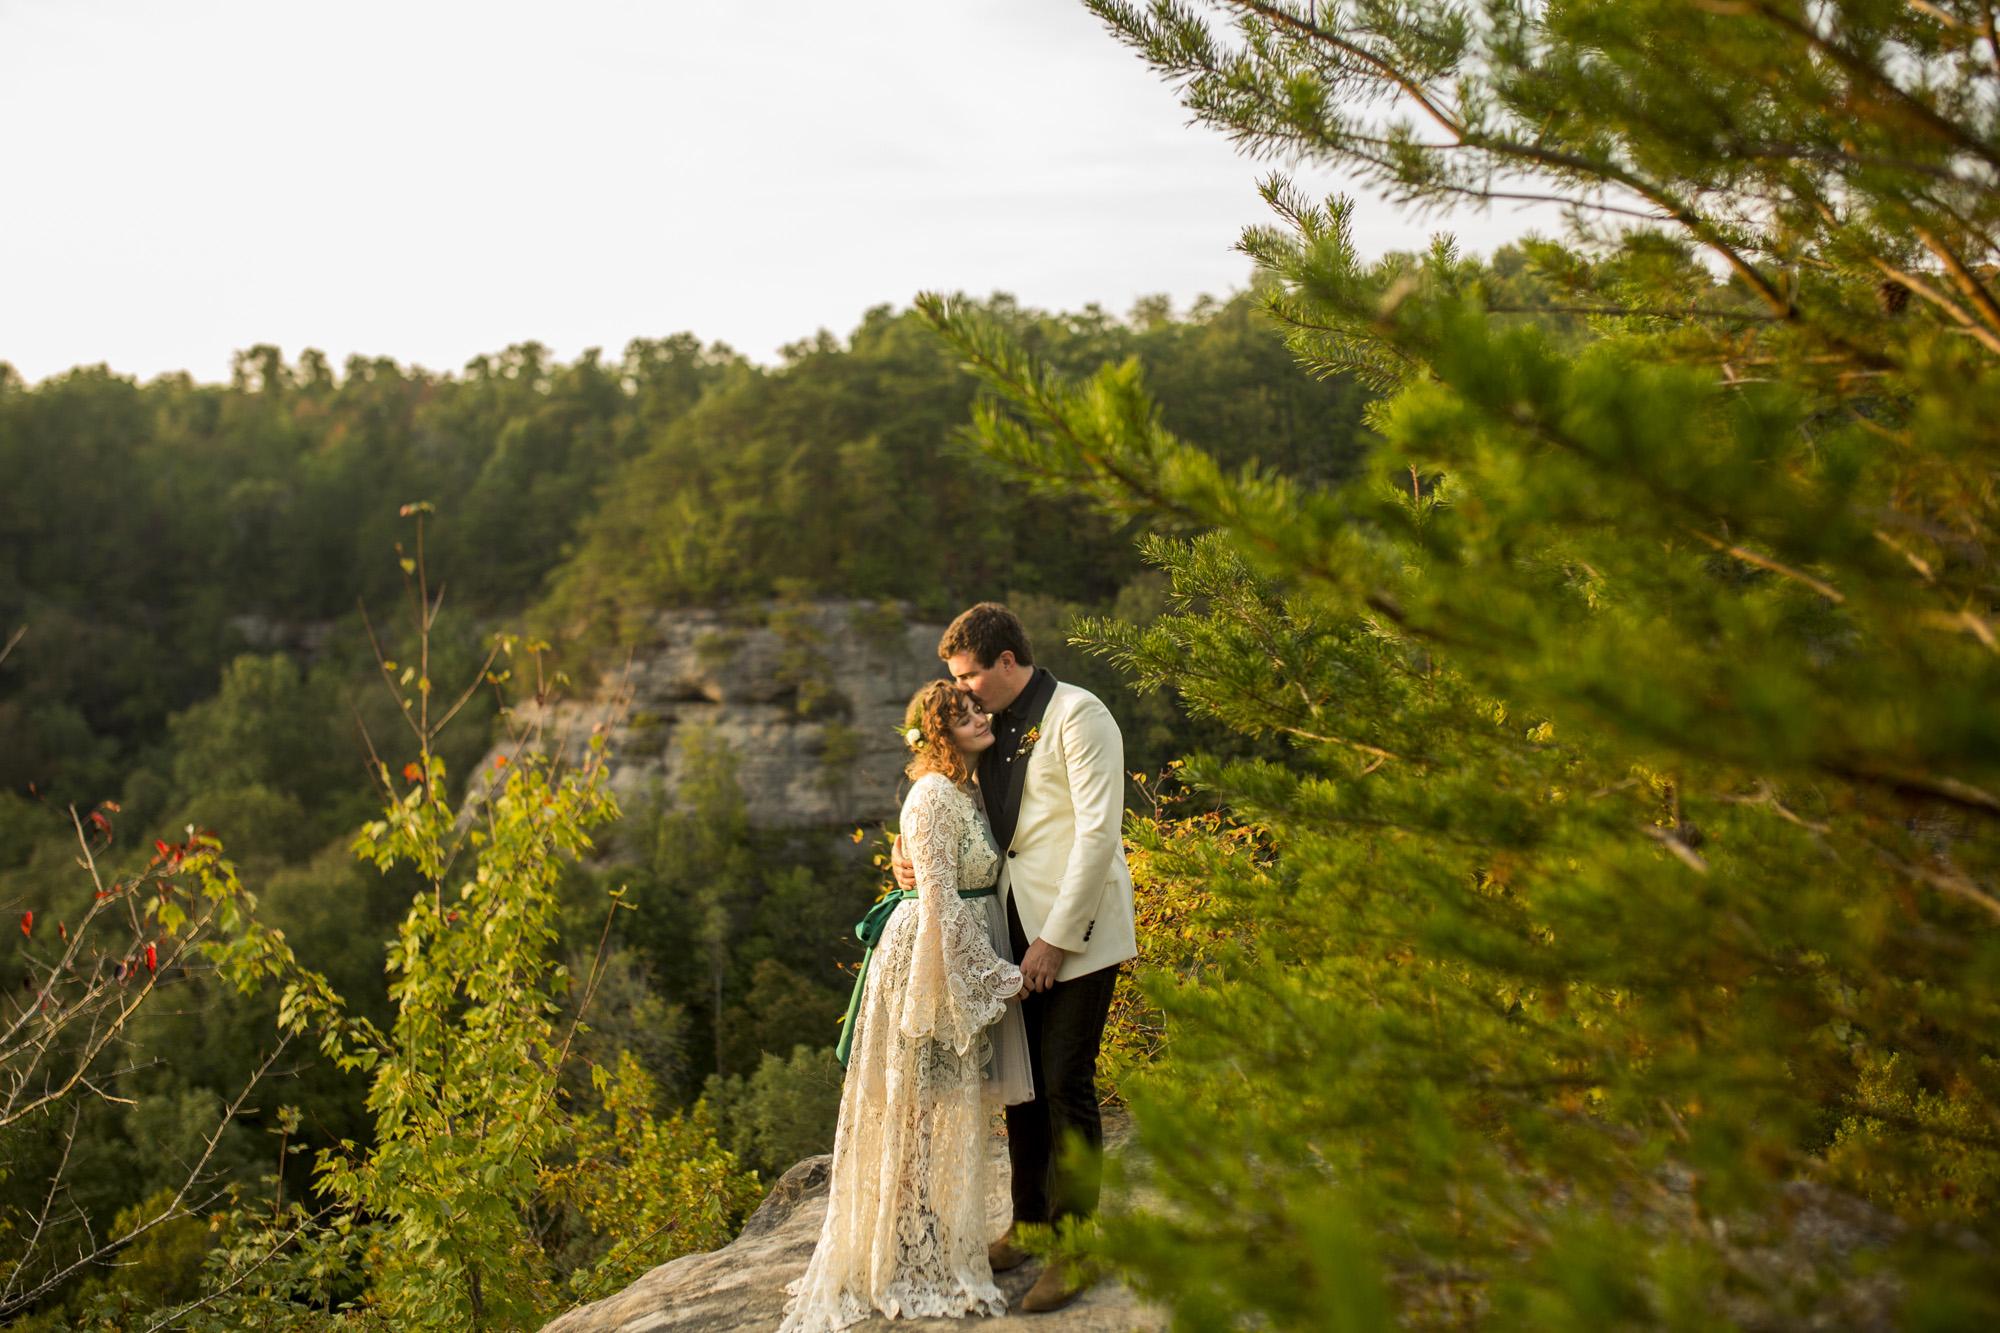 Seriously_Sabrina_Photography_Red_River_Gorge_Kentucky_Wedding_ShawnDana160.jpg